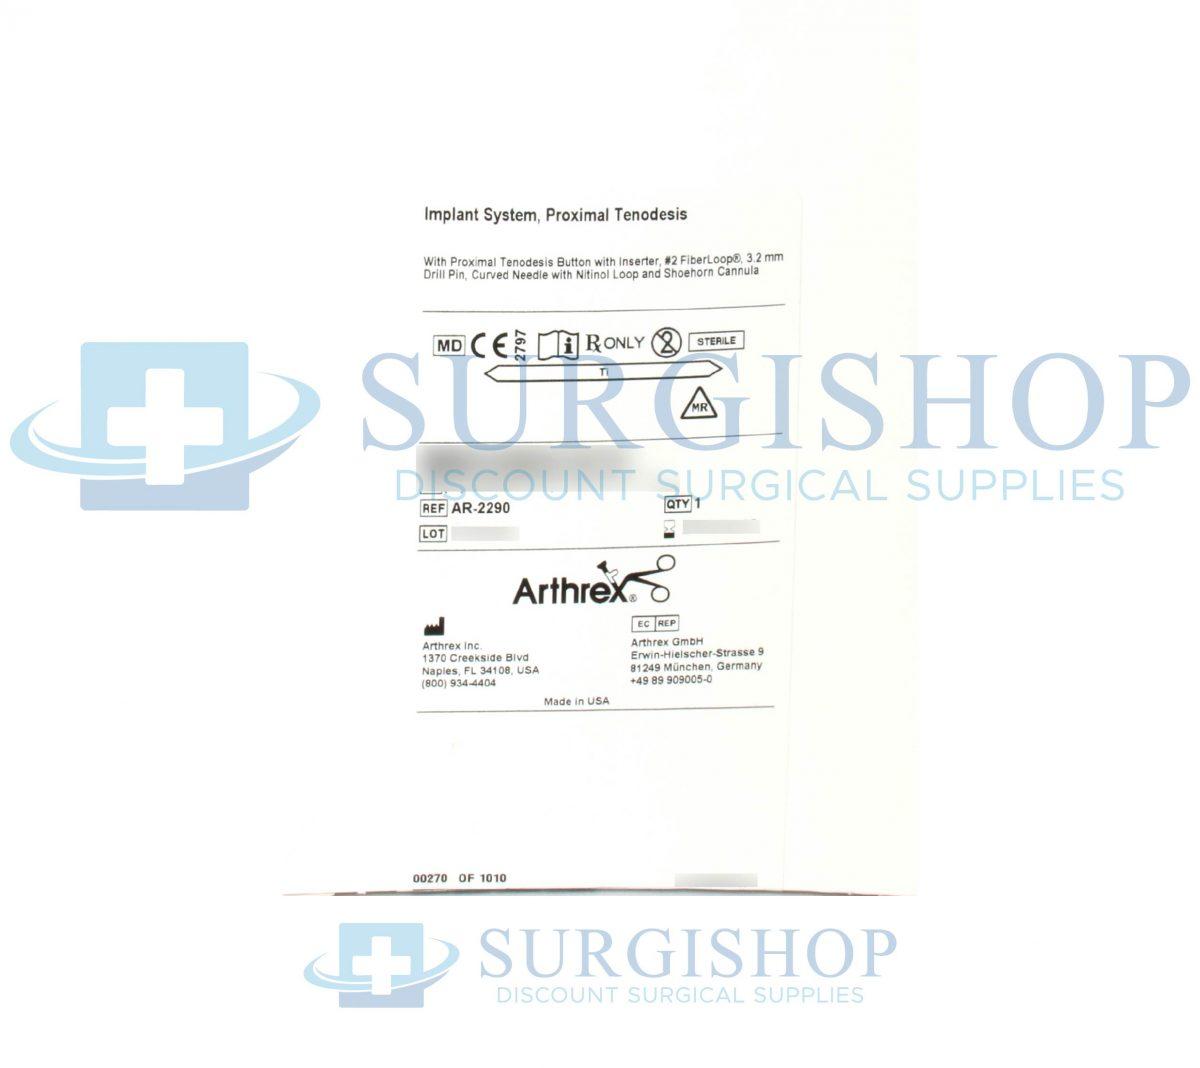 Arthrex Proximal Tenodesis Implant System